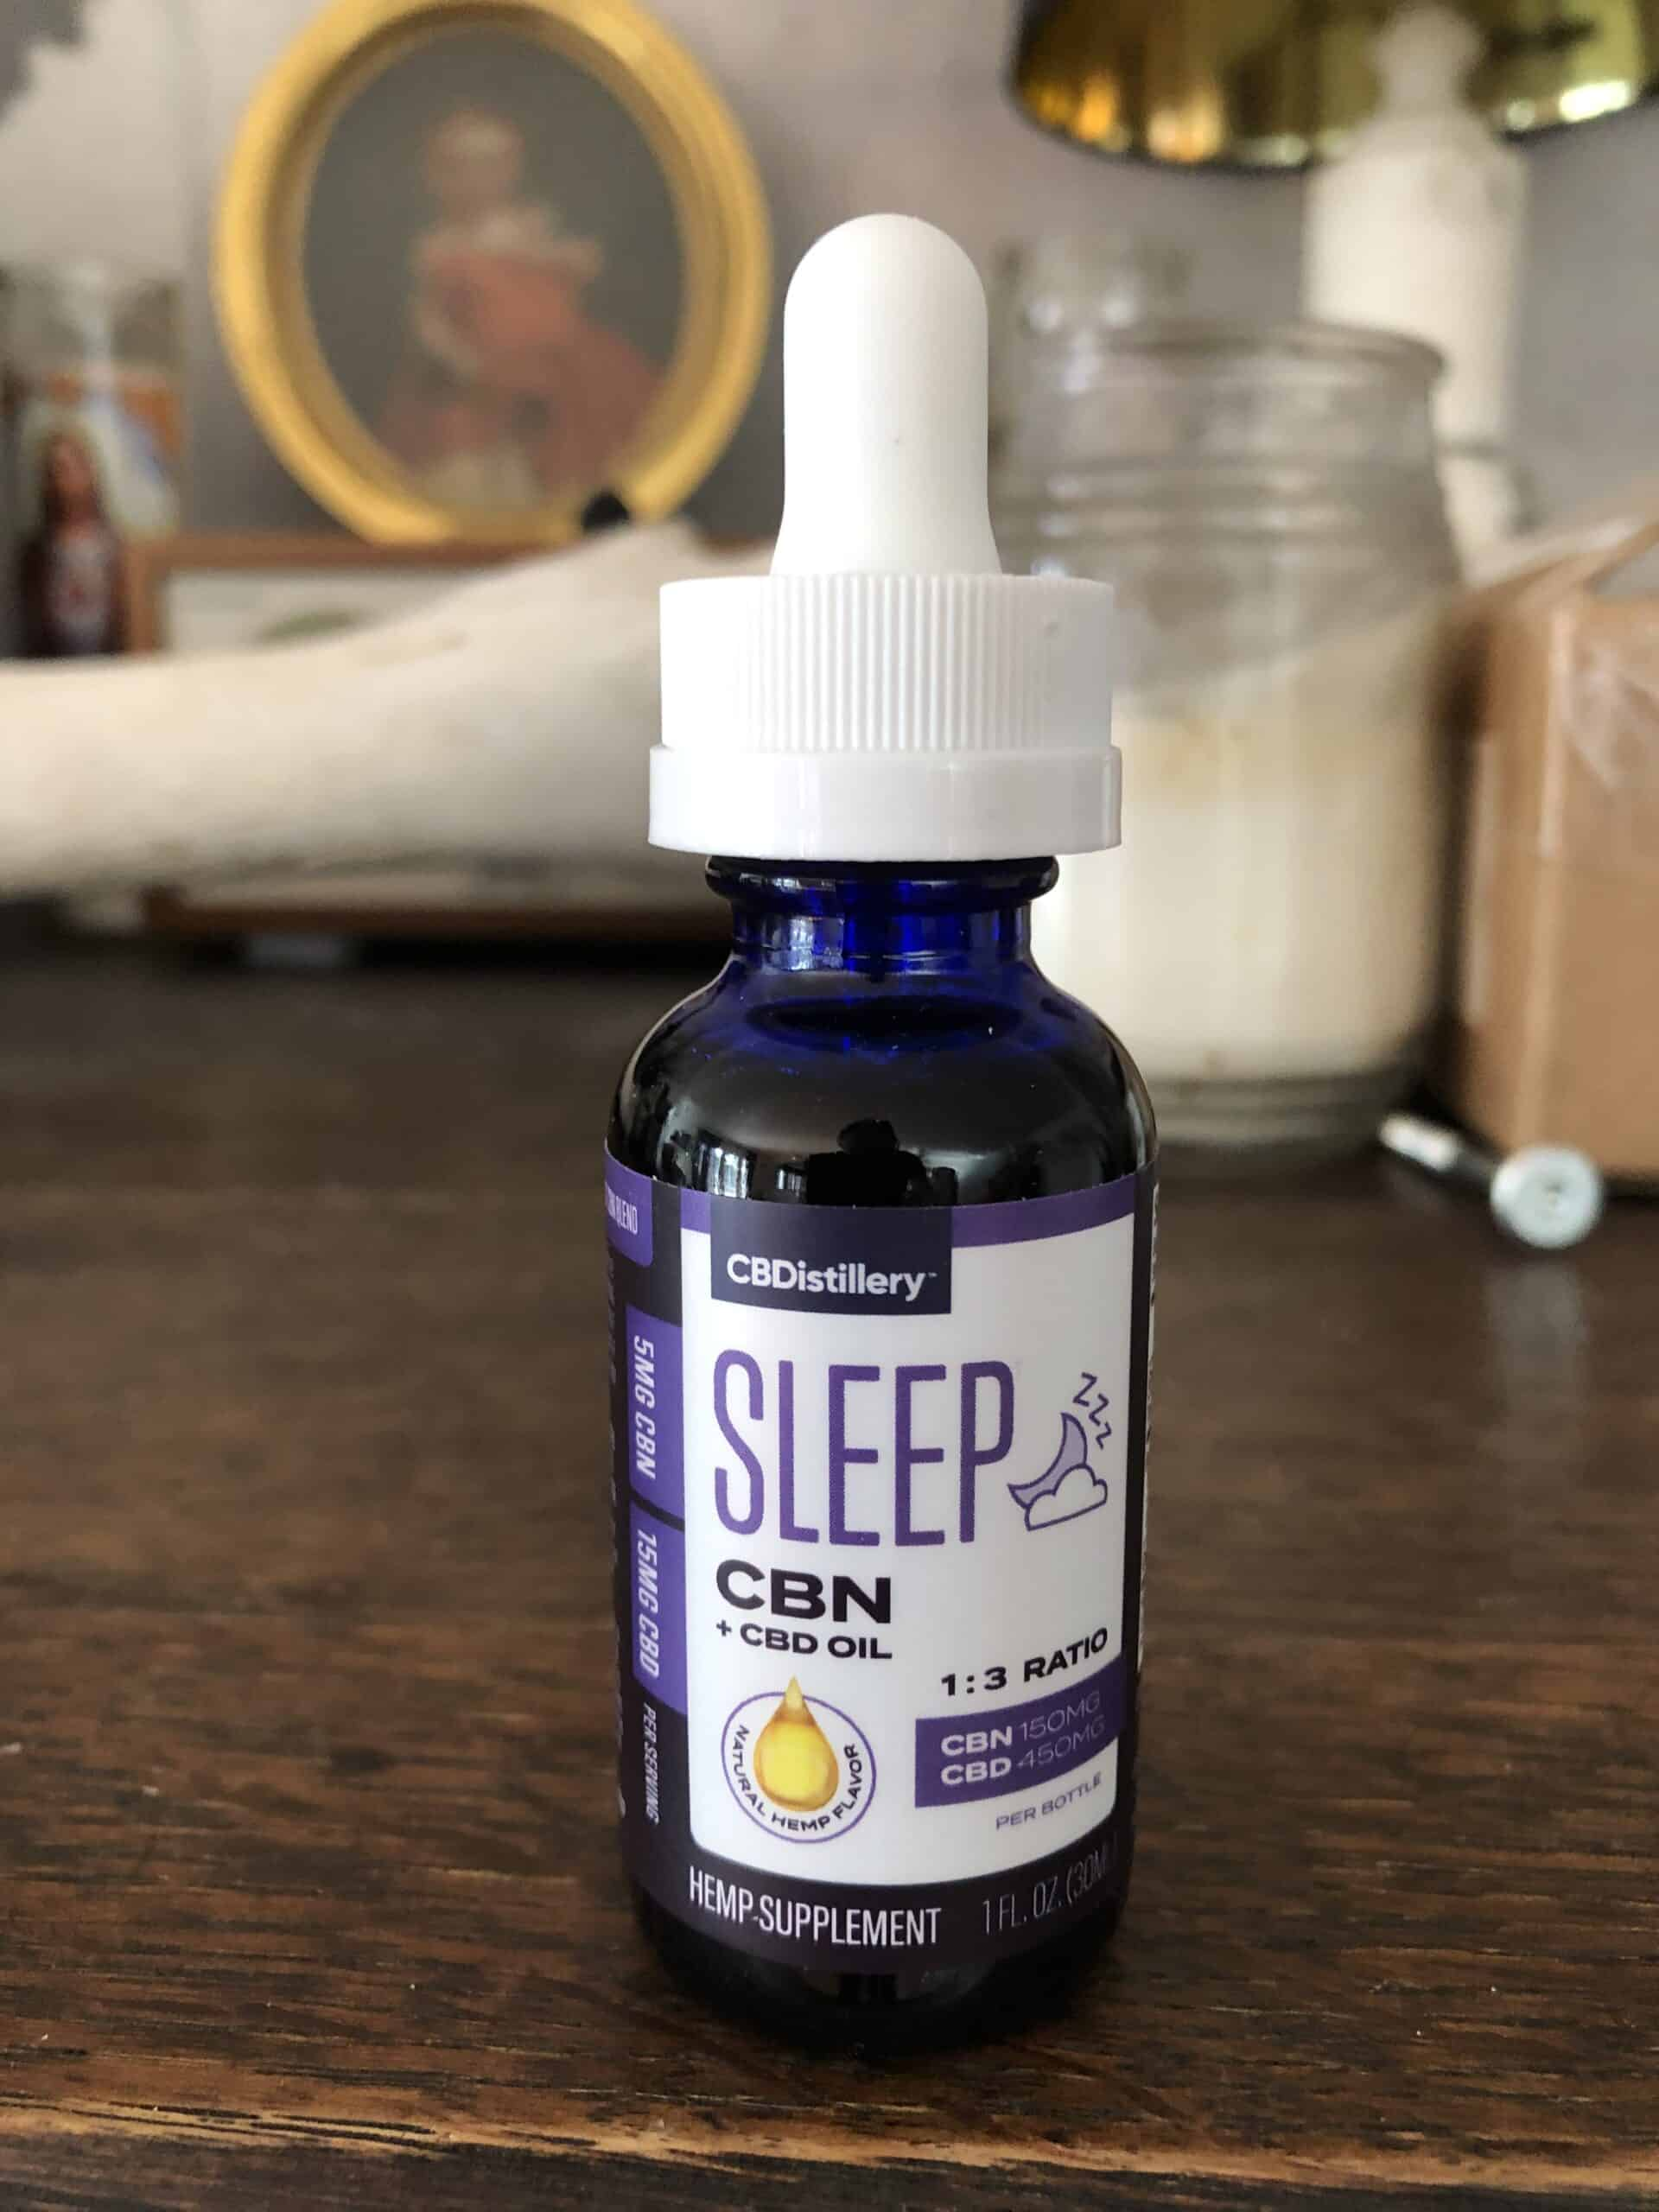 CBDISTILLERY CBN + CBD SLEEP TINCTURE 1:3 - 150mg CBN + 450mg CBD review beauty shot